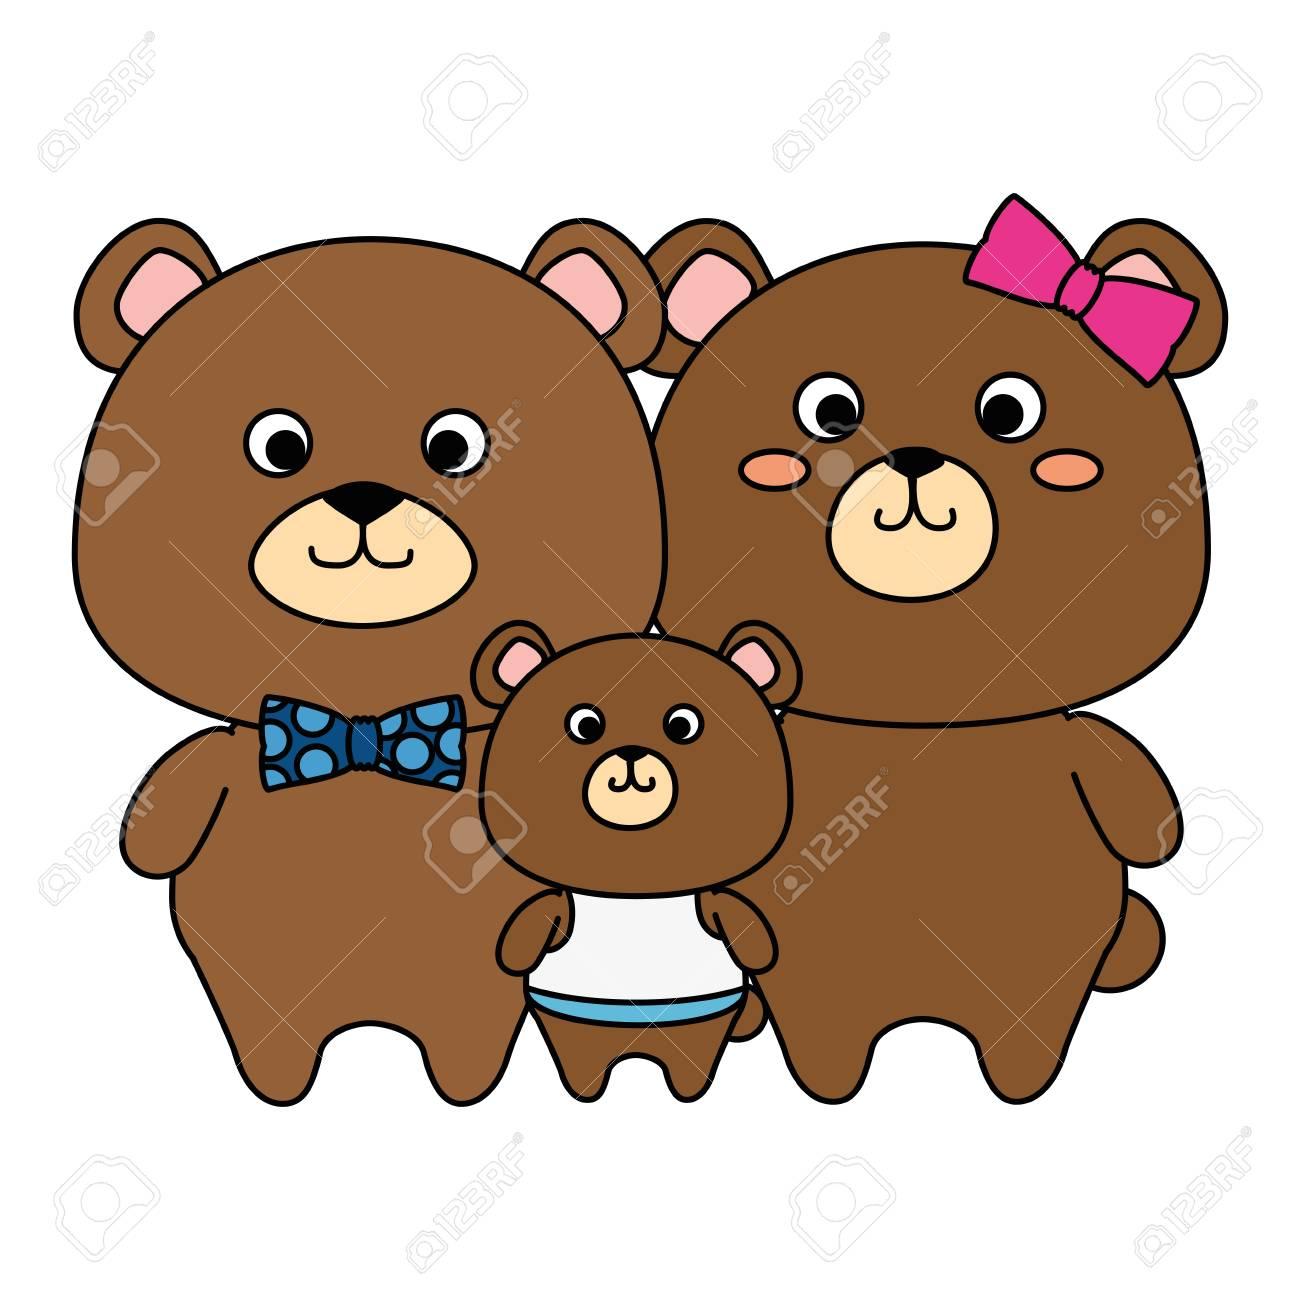 Goldilocks And Three Bears Royalty Free Cliparts, Vectors, And Stock  Illustration. Image 33980288.